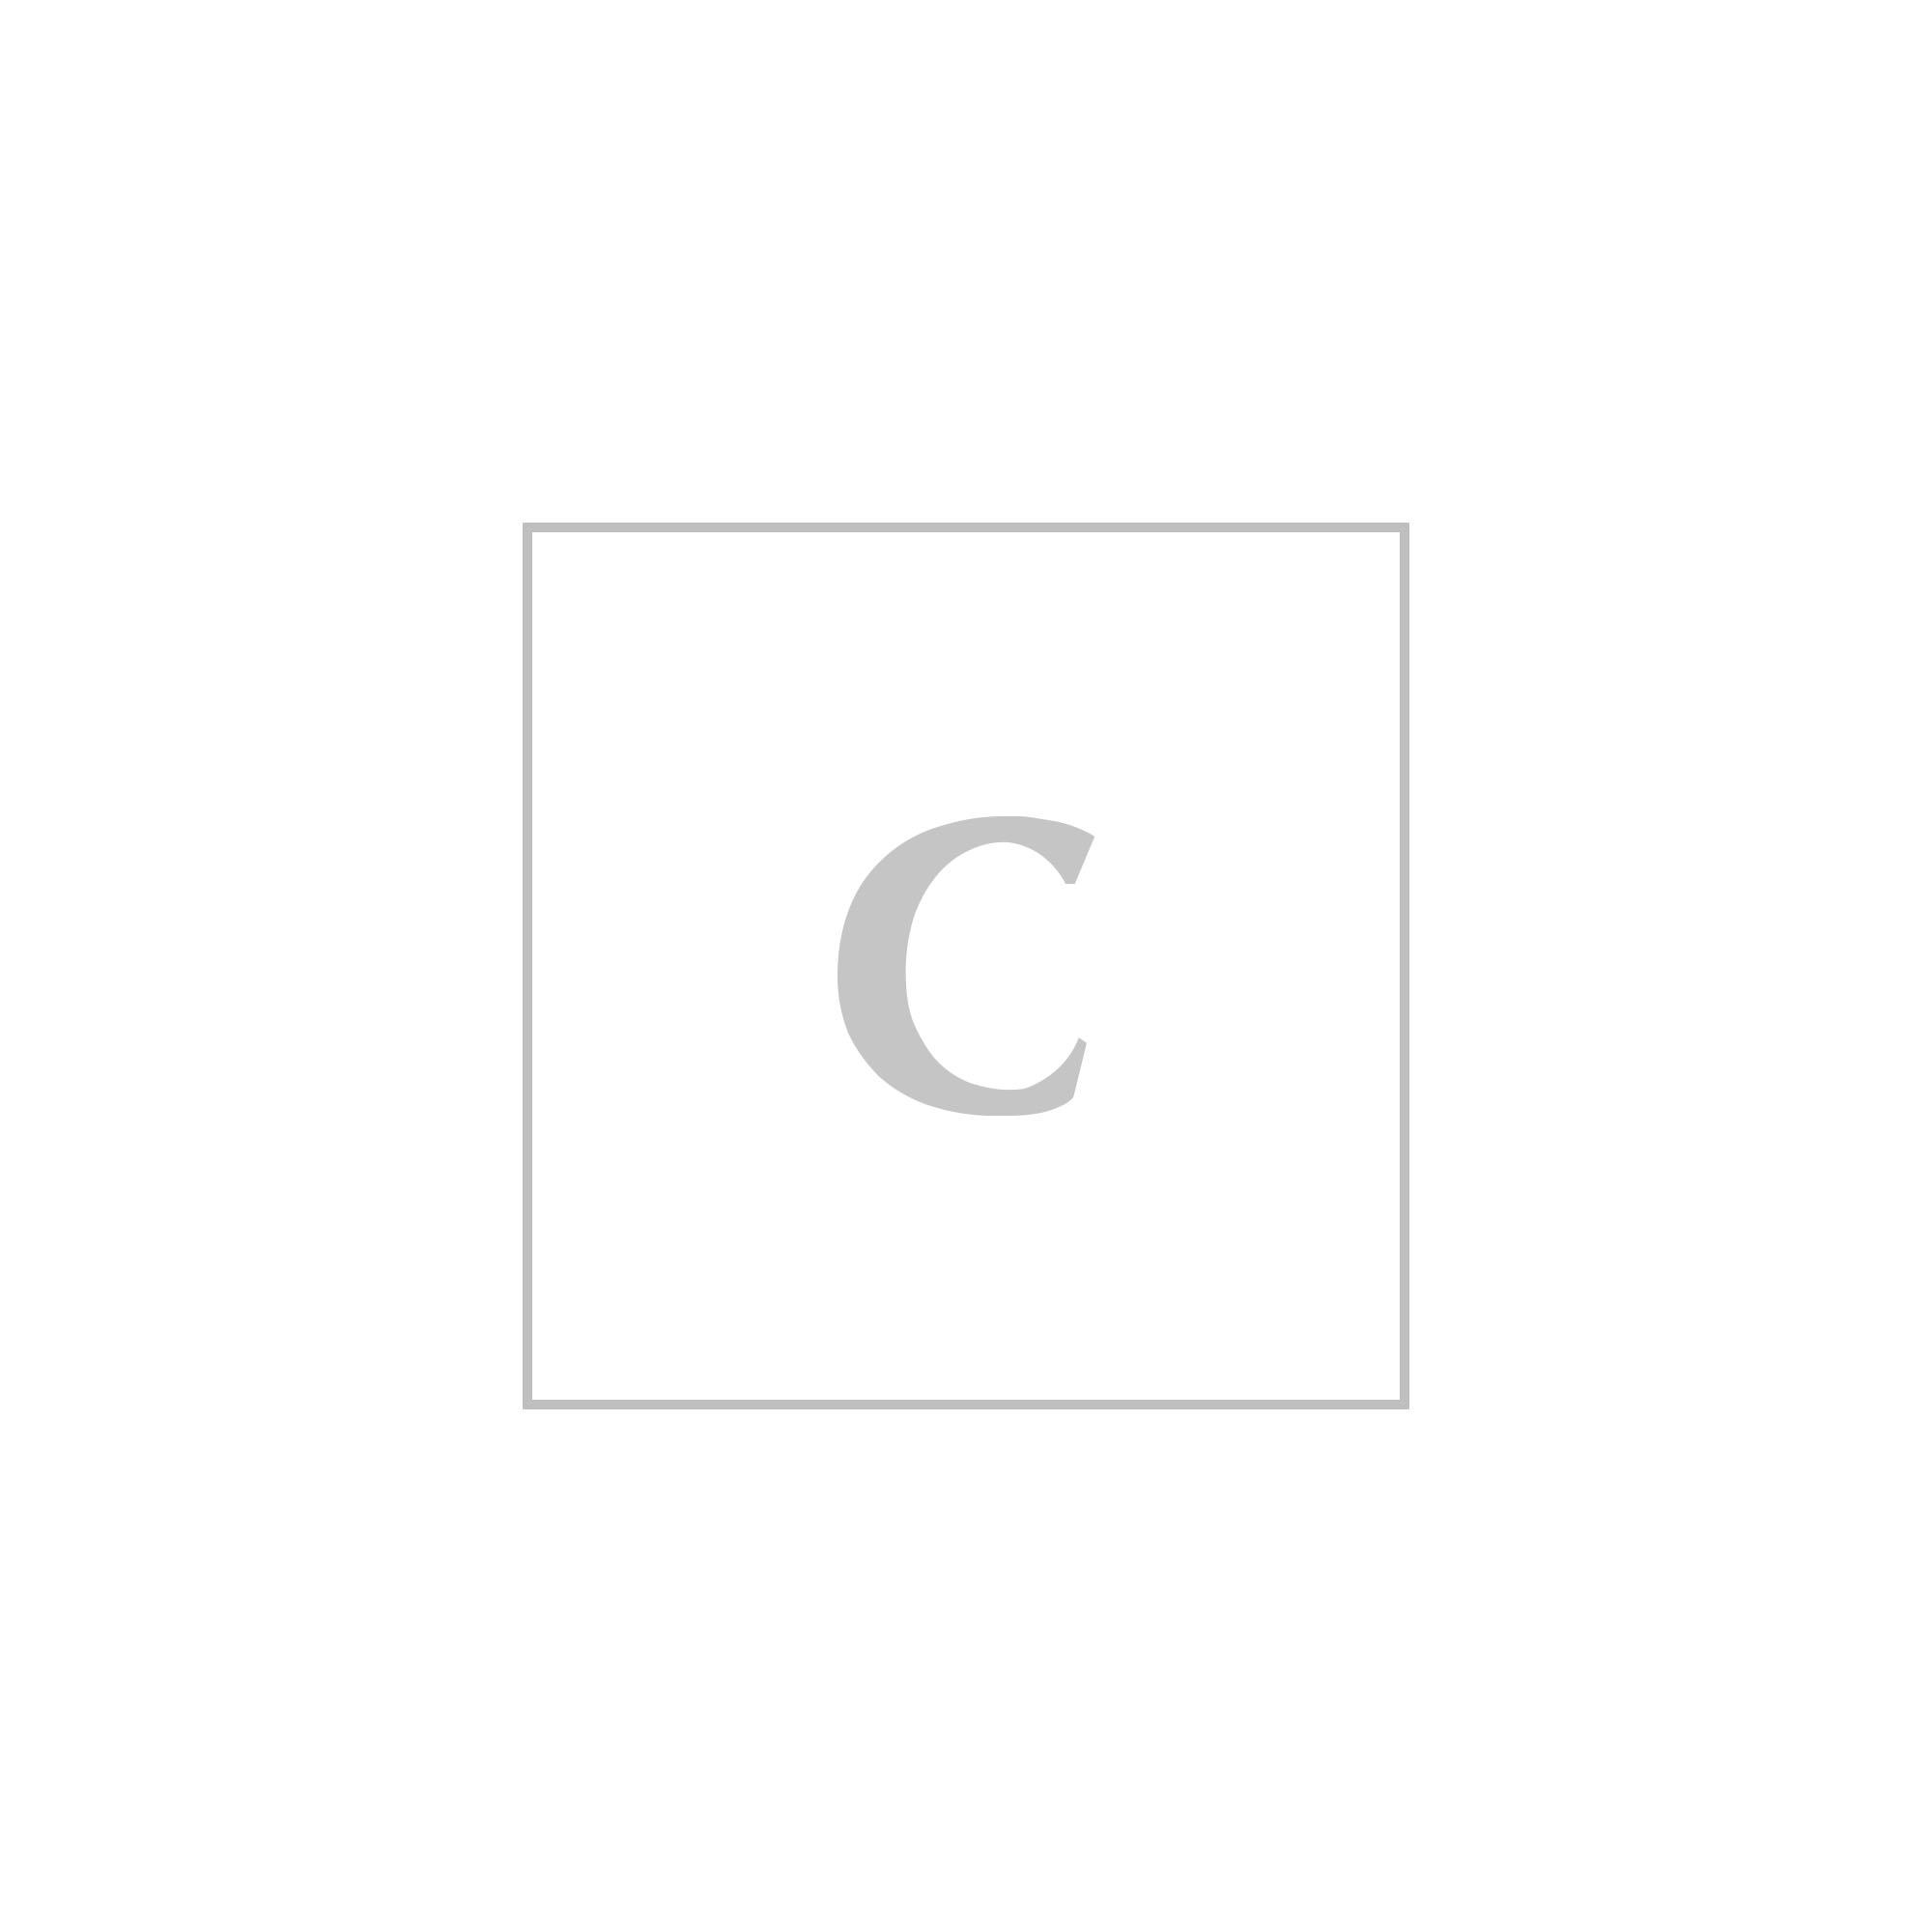 Moncler gamme rouge/bleu giaccone